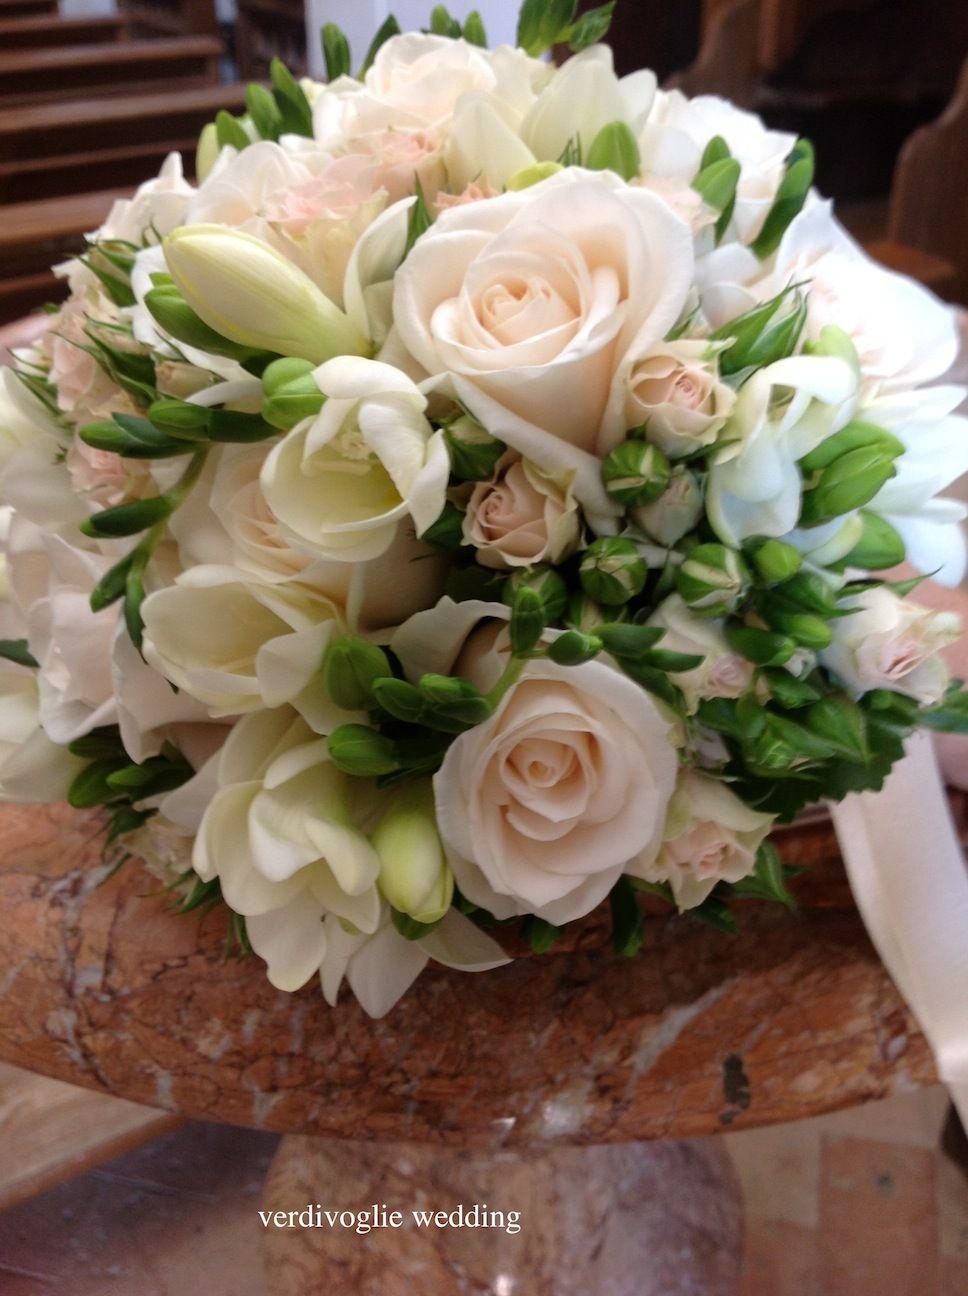 Bouquet Sposa Fresie.Buoquet Rose Fresie E Boccioli Di Garofano Bouquet Di Rose